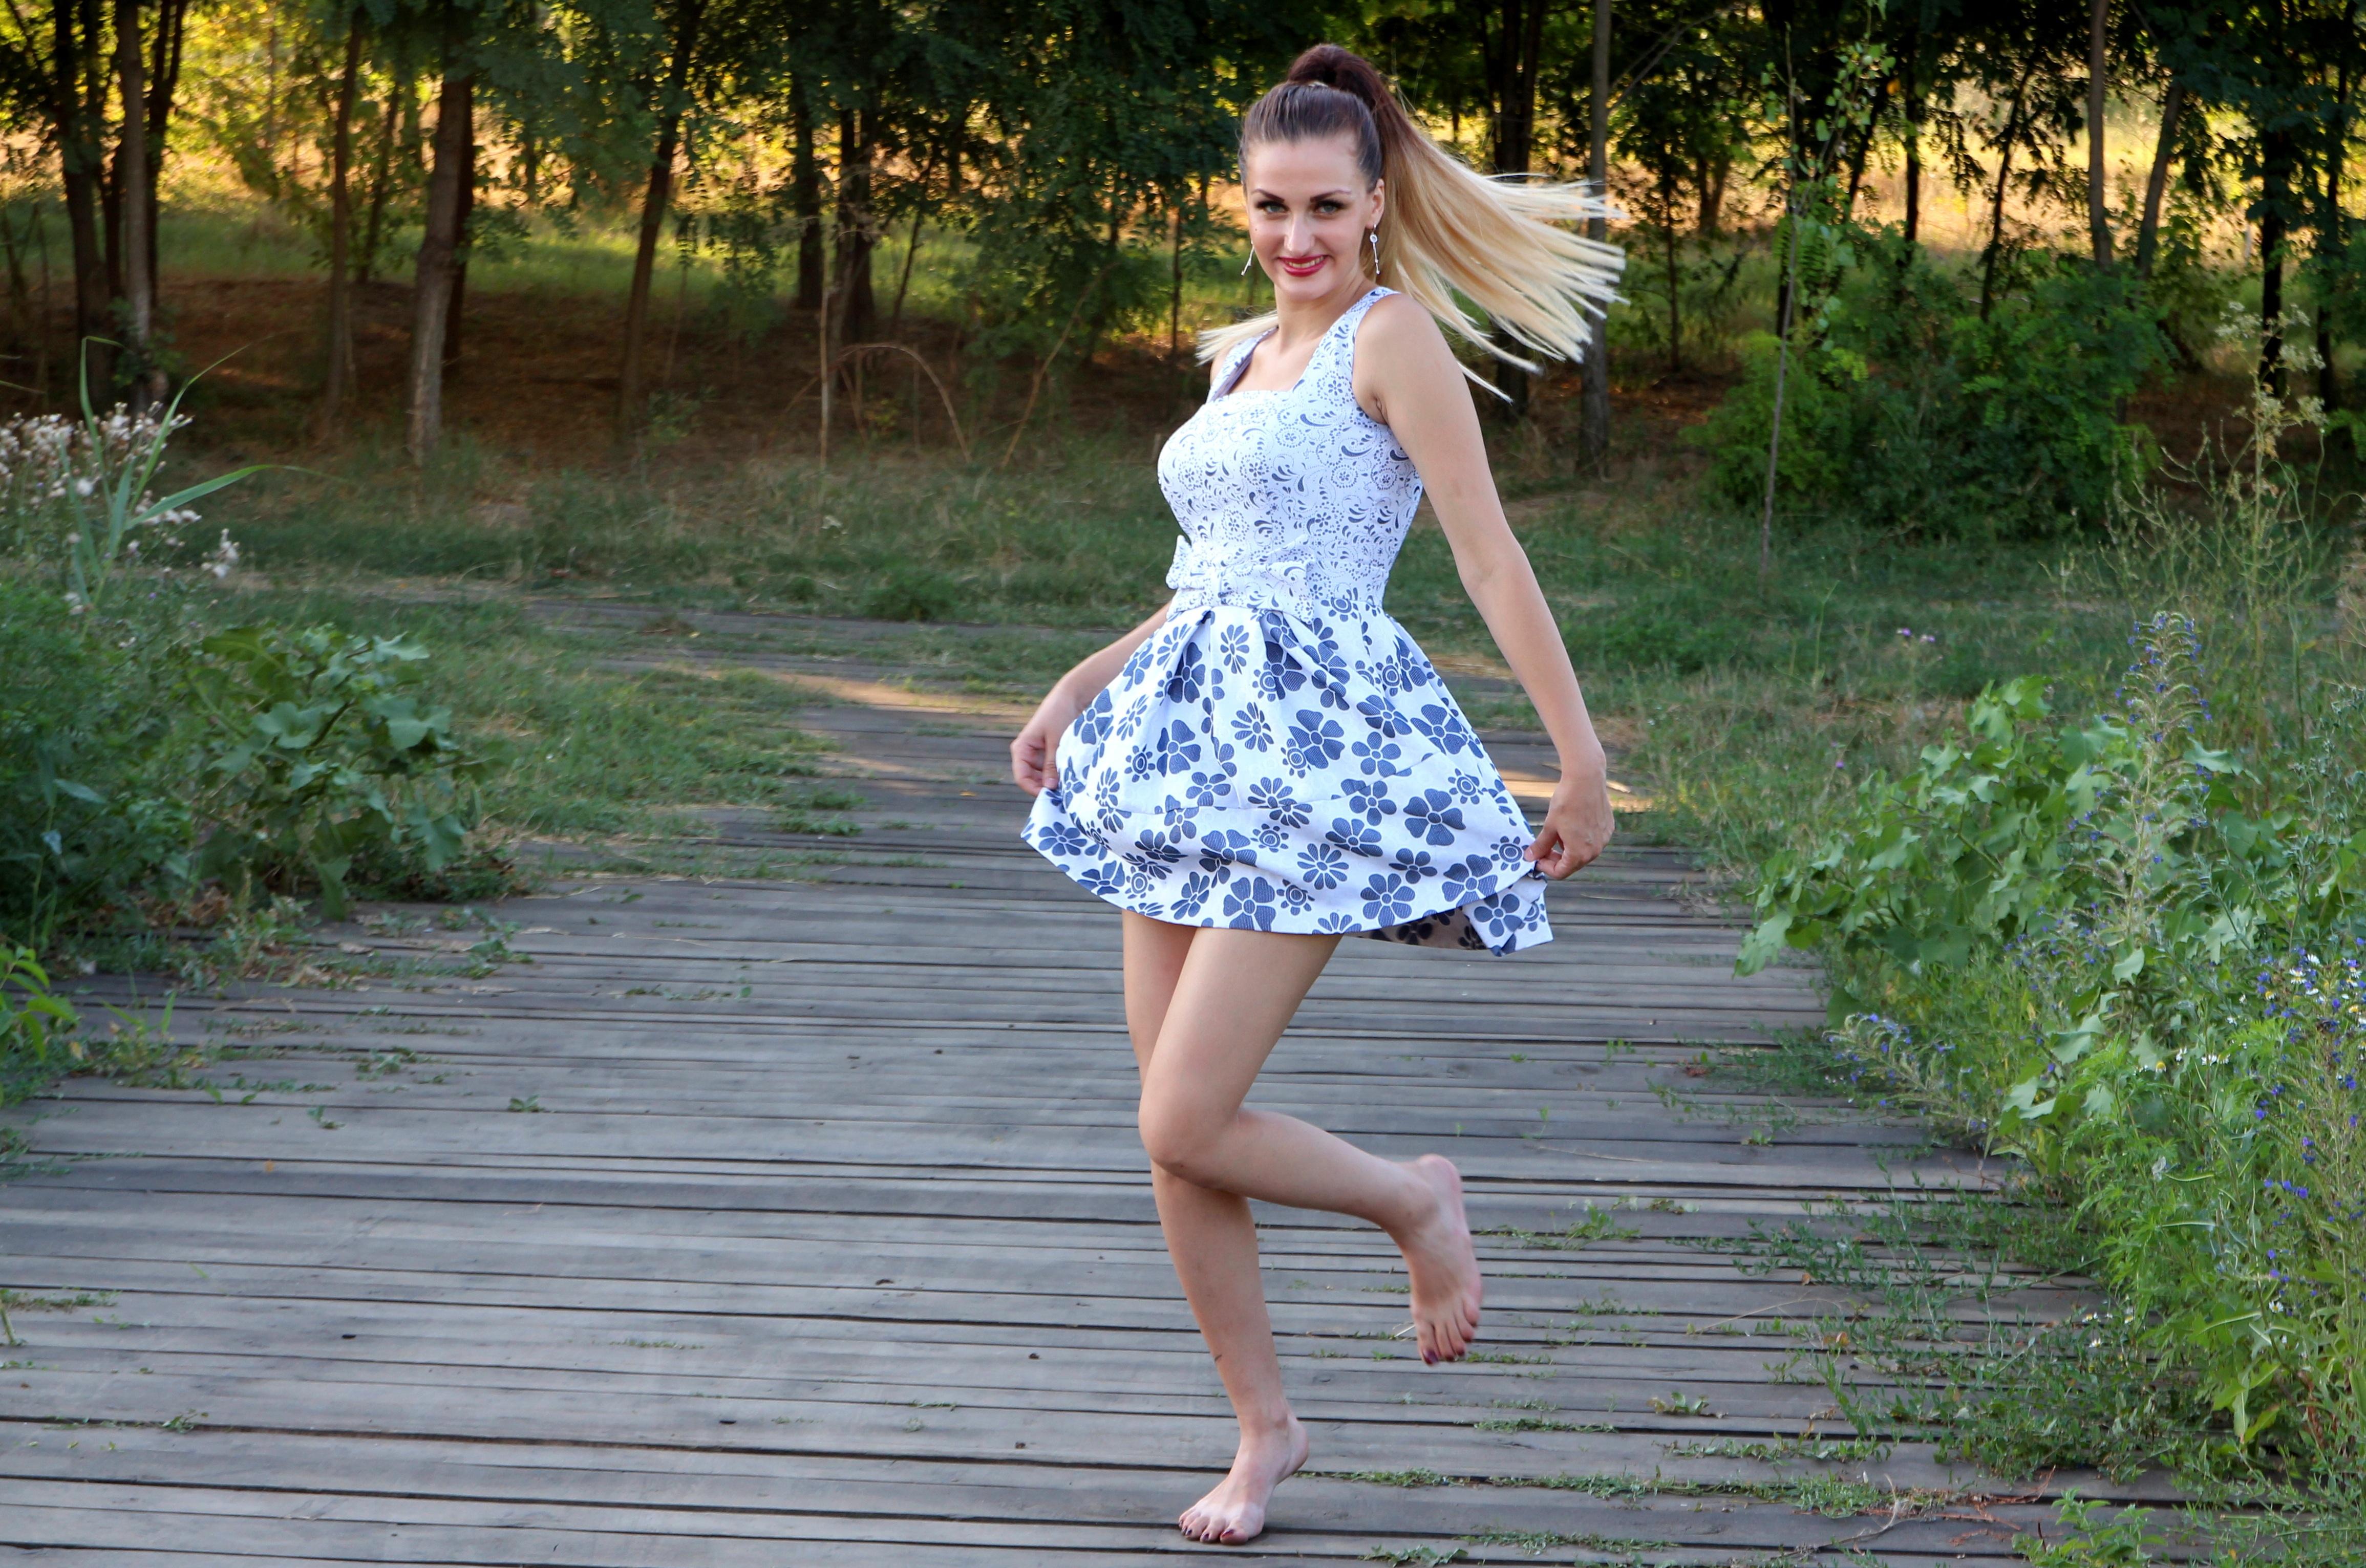 girl-dress-bounce-nature-160826.jpeg (4621×3063)